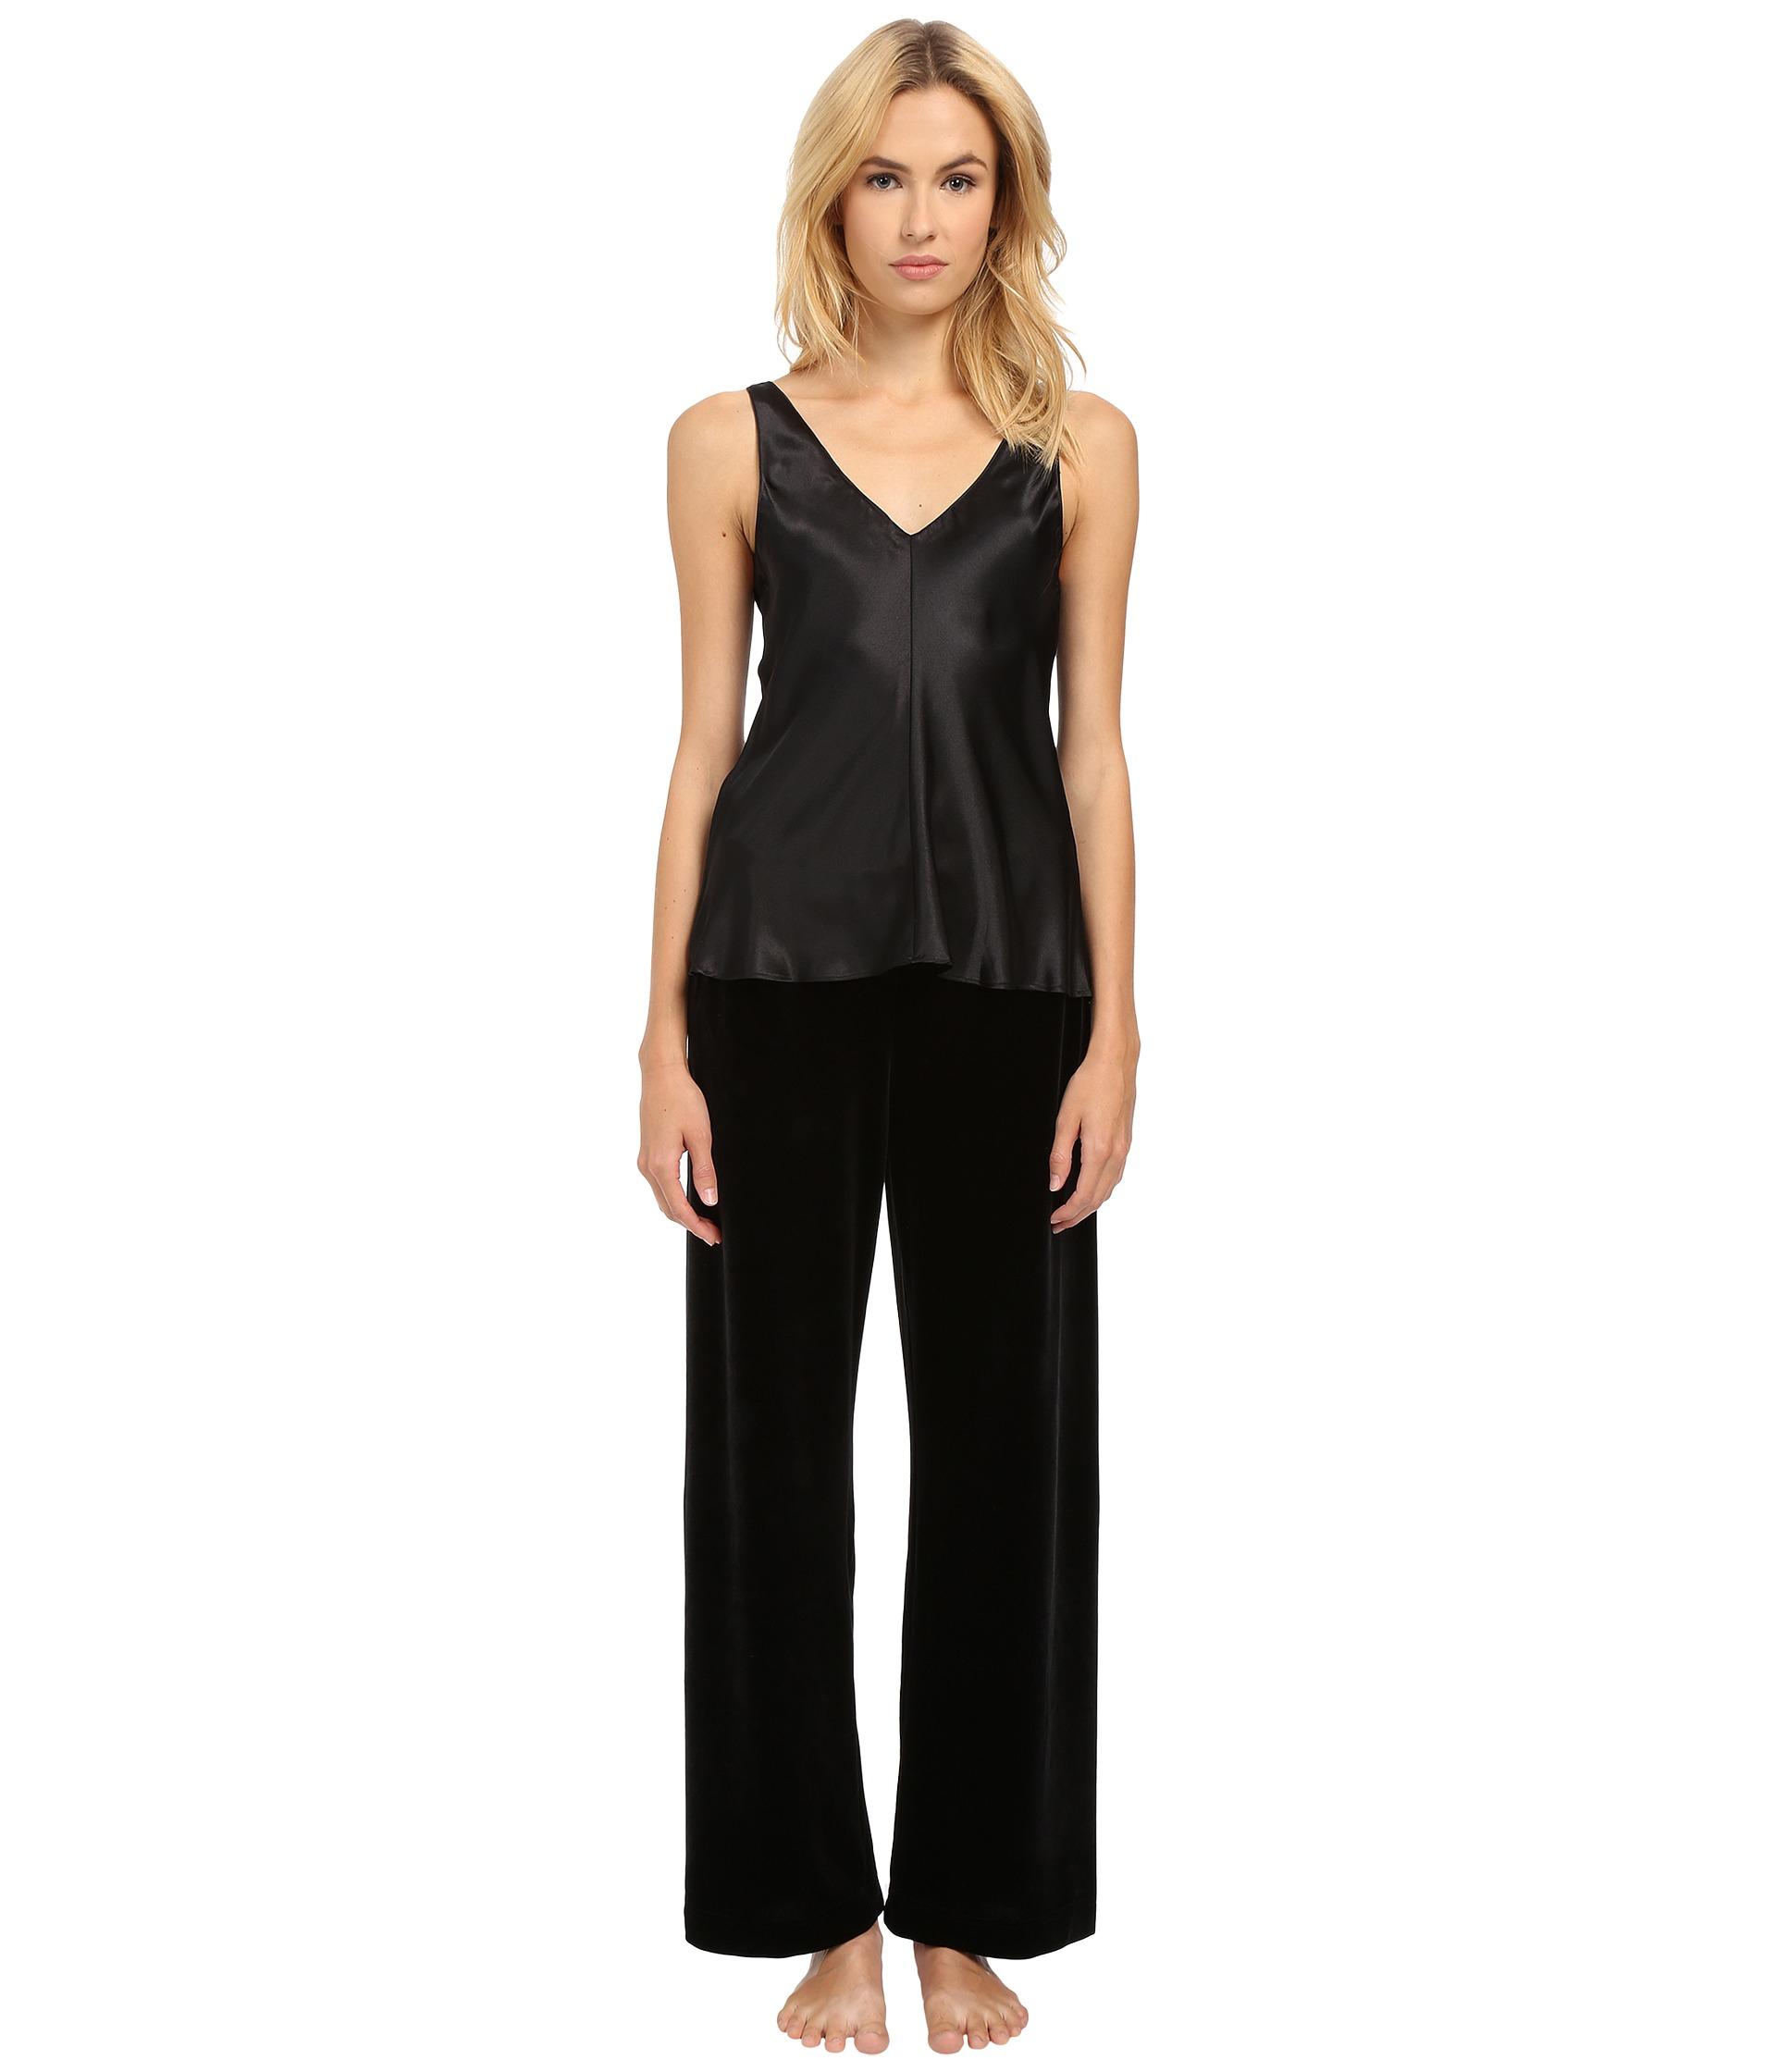 Lyst - Oscar de la Renta Two-piece Pajama - Charmeuse Top And Velvet ... d9e96b633